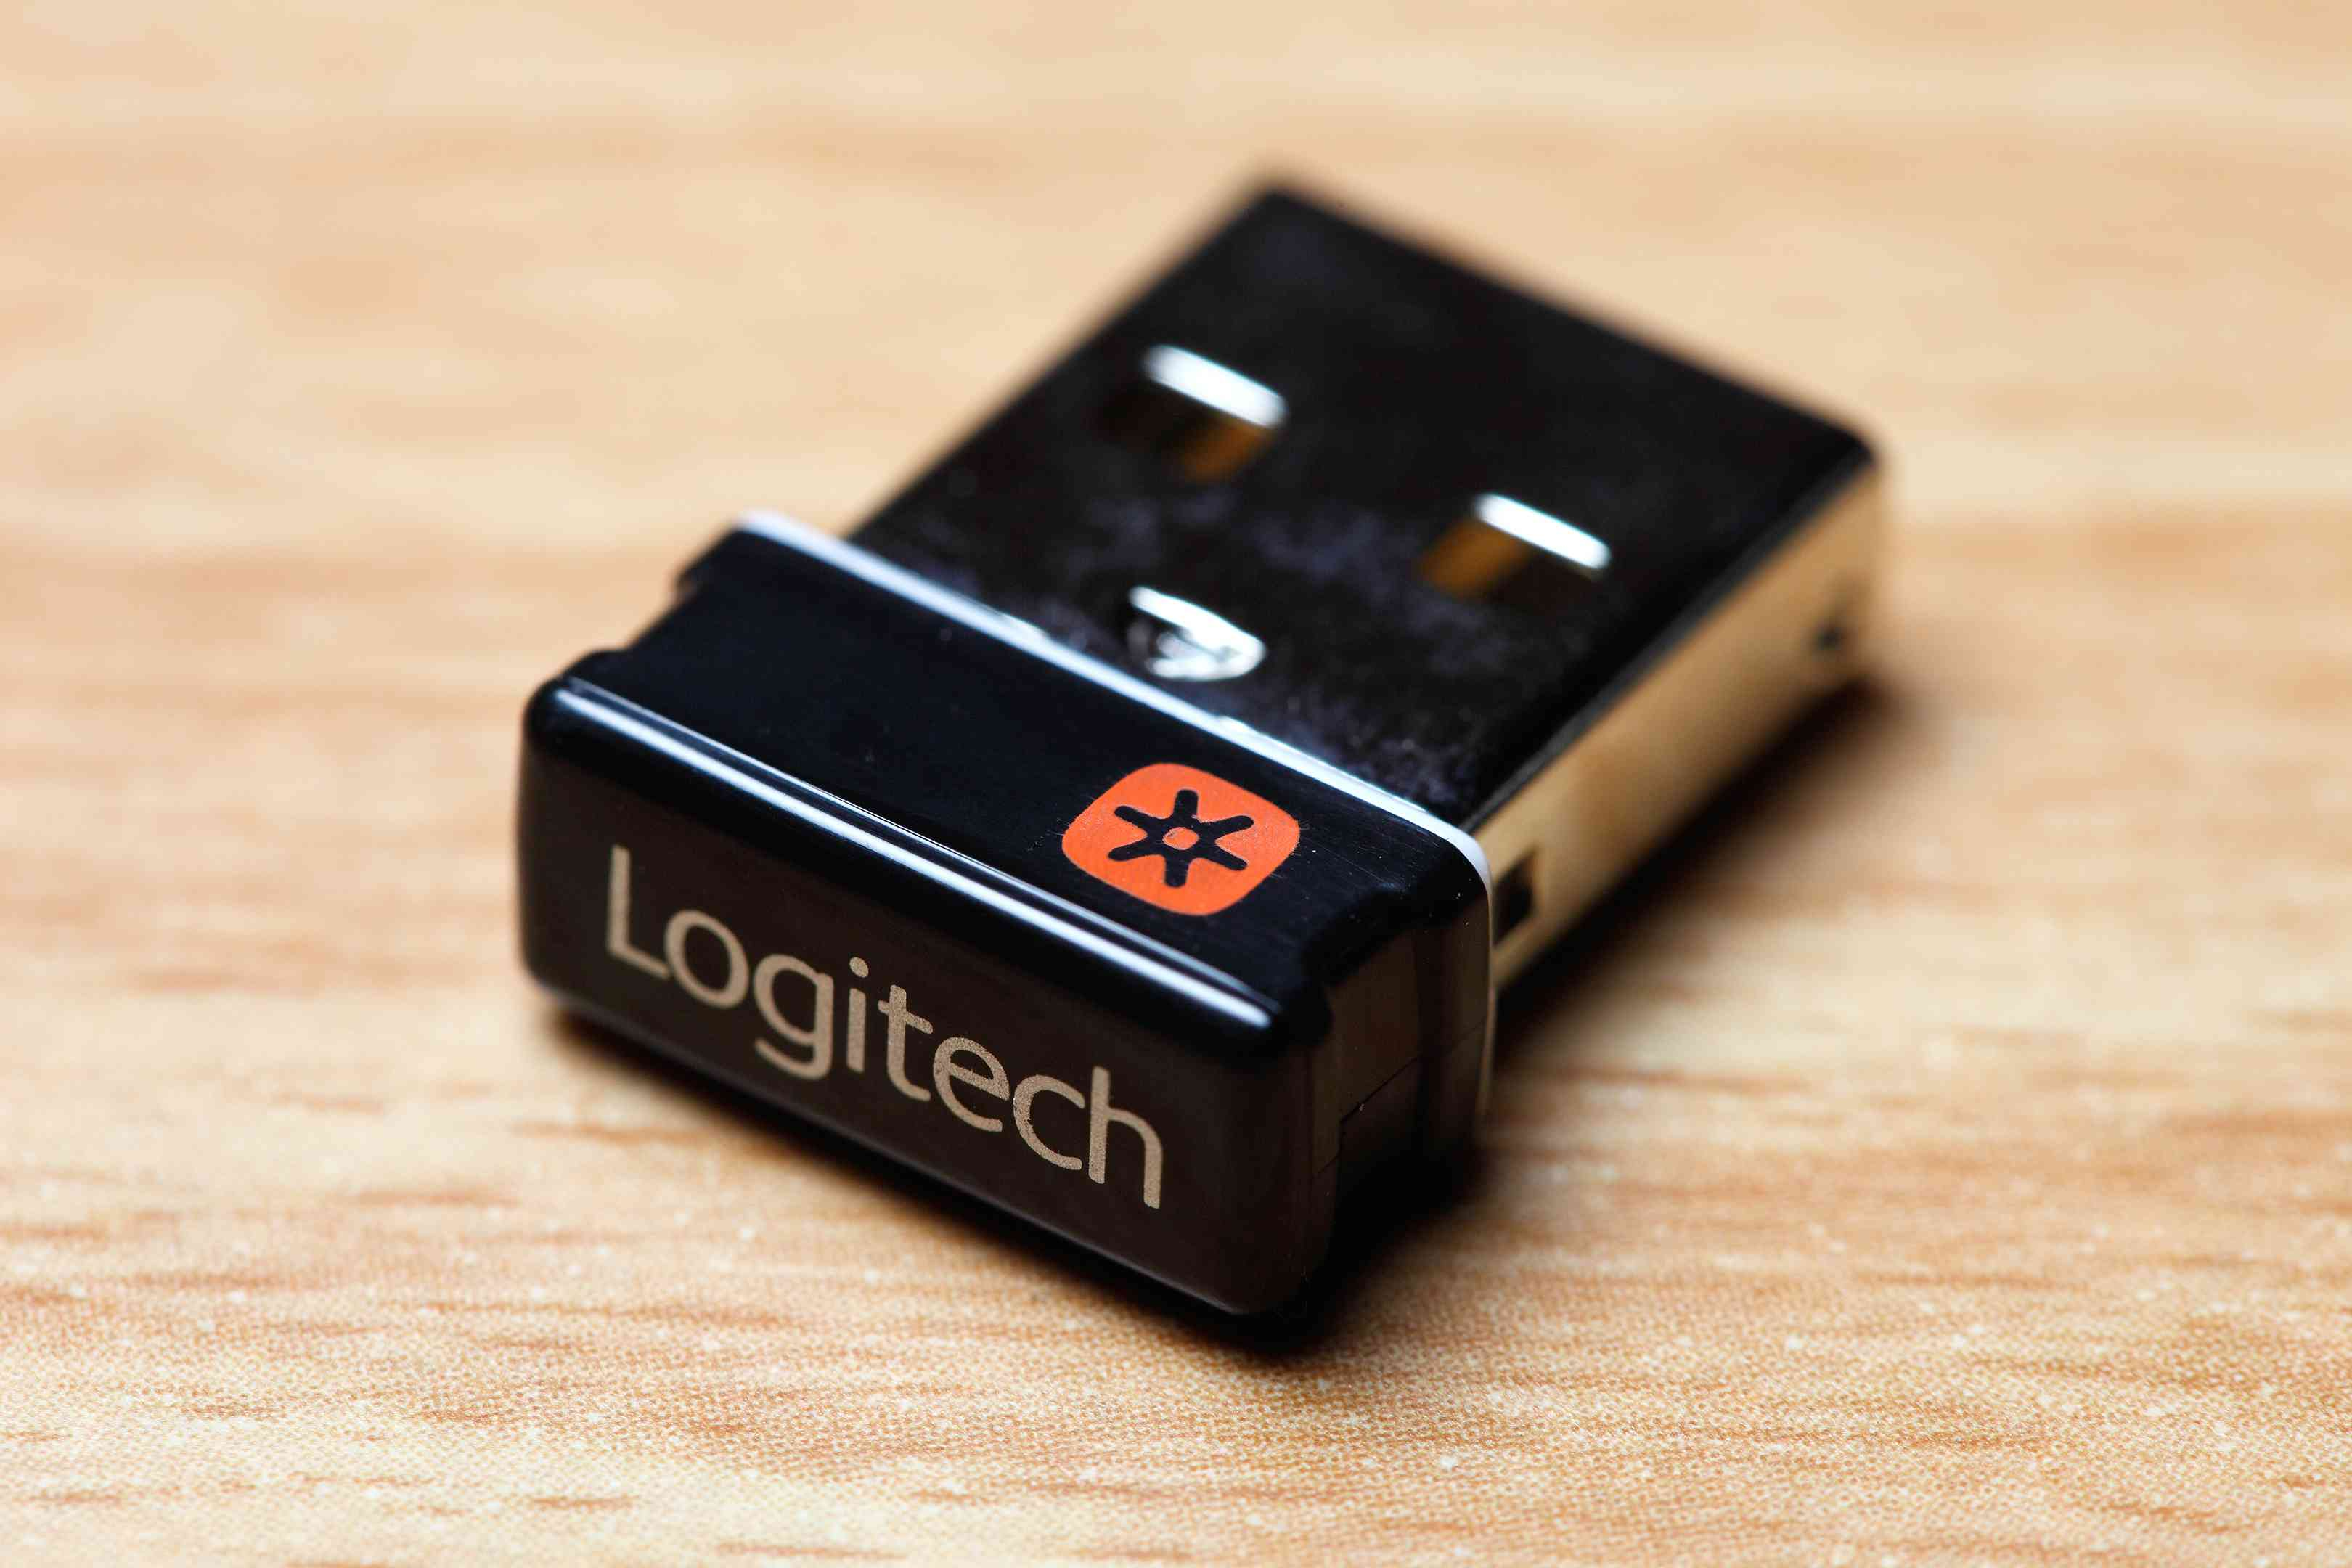 Logitech Unified Receiver - Early Model